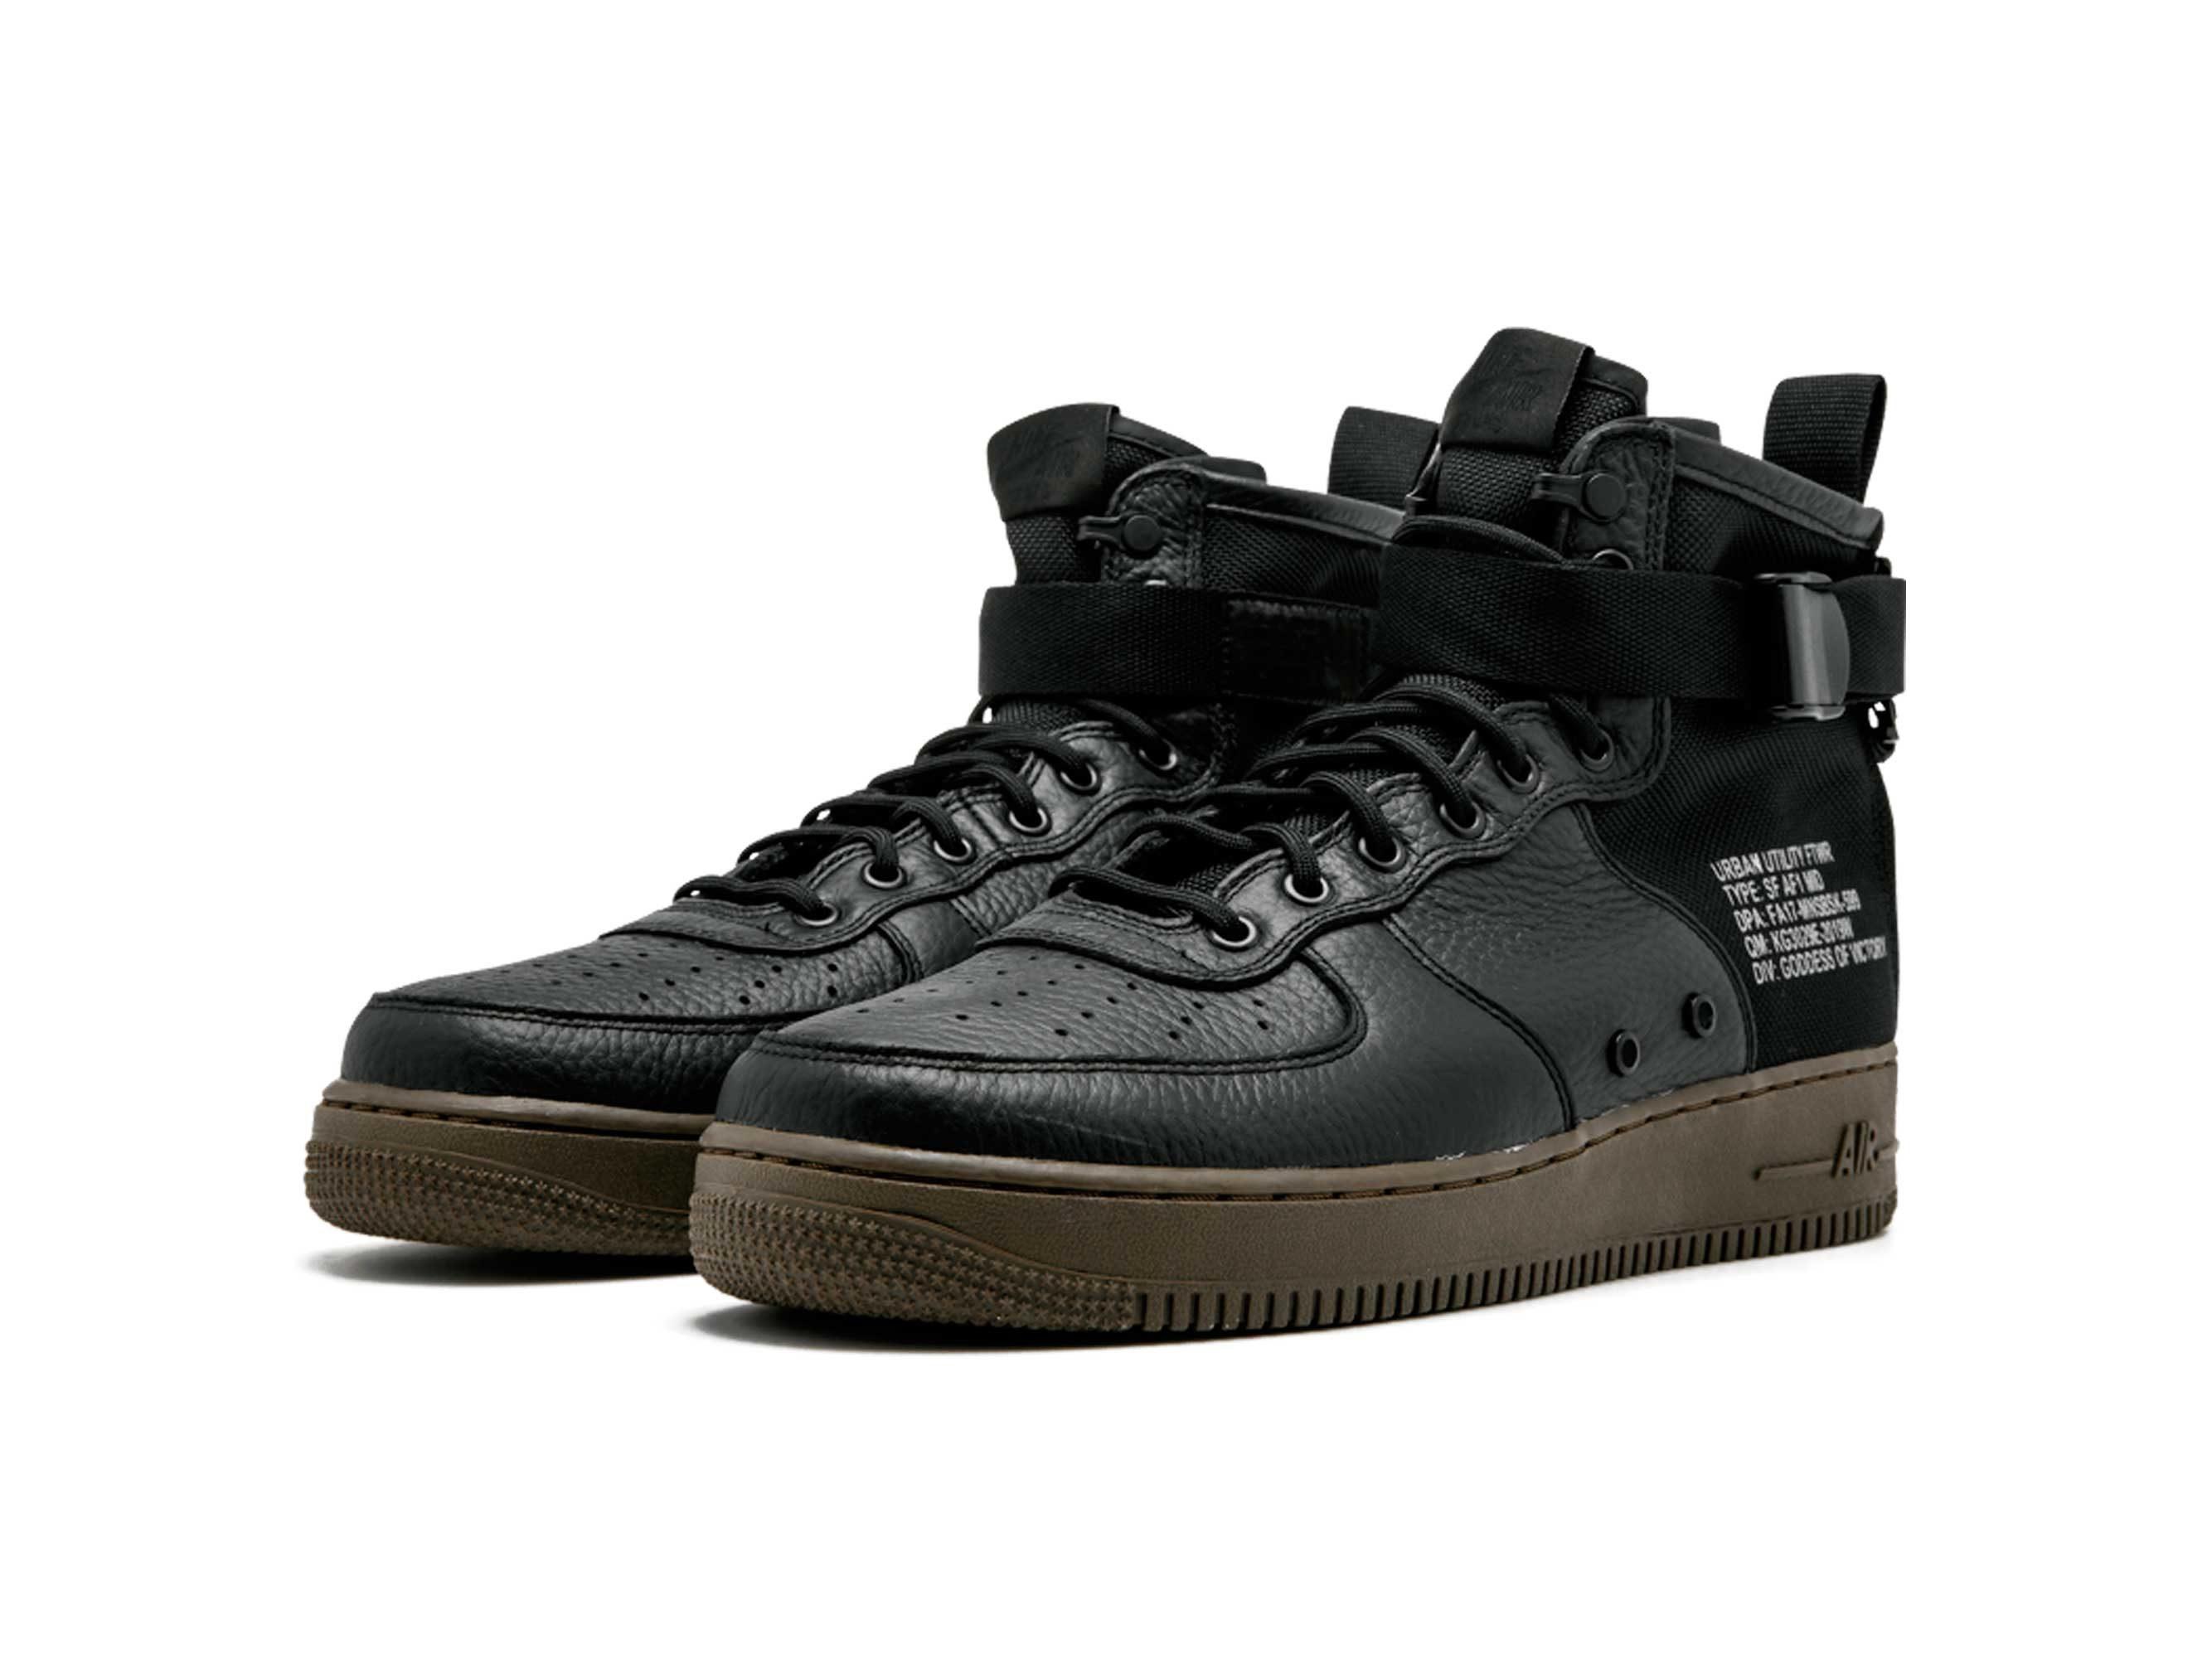 nike sf air force 1 mid black917753-002 купить